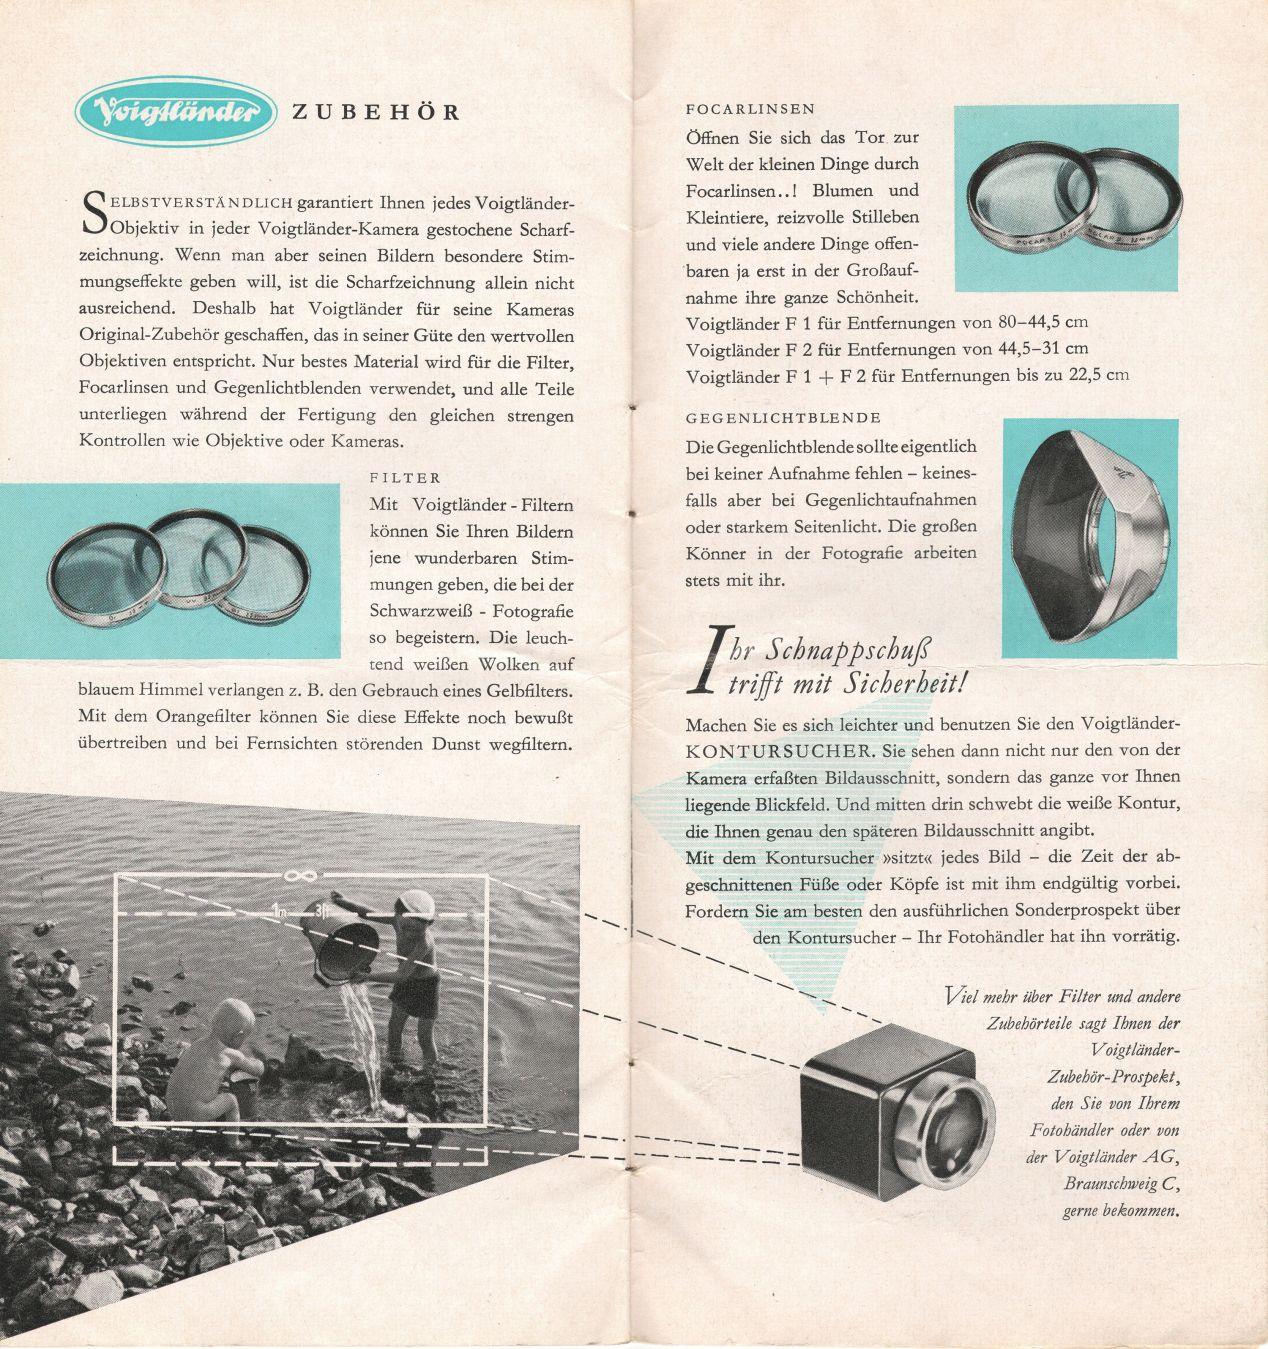 Vintage ad for Vitessa accessories.